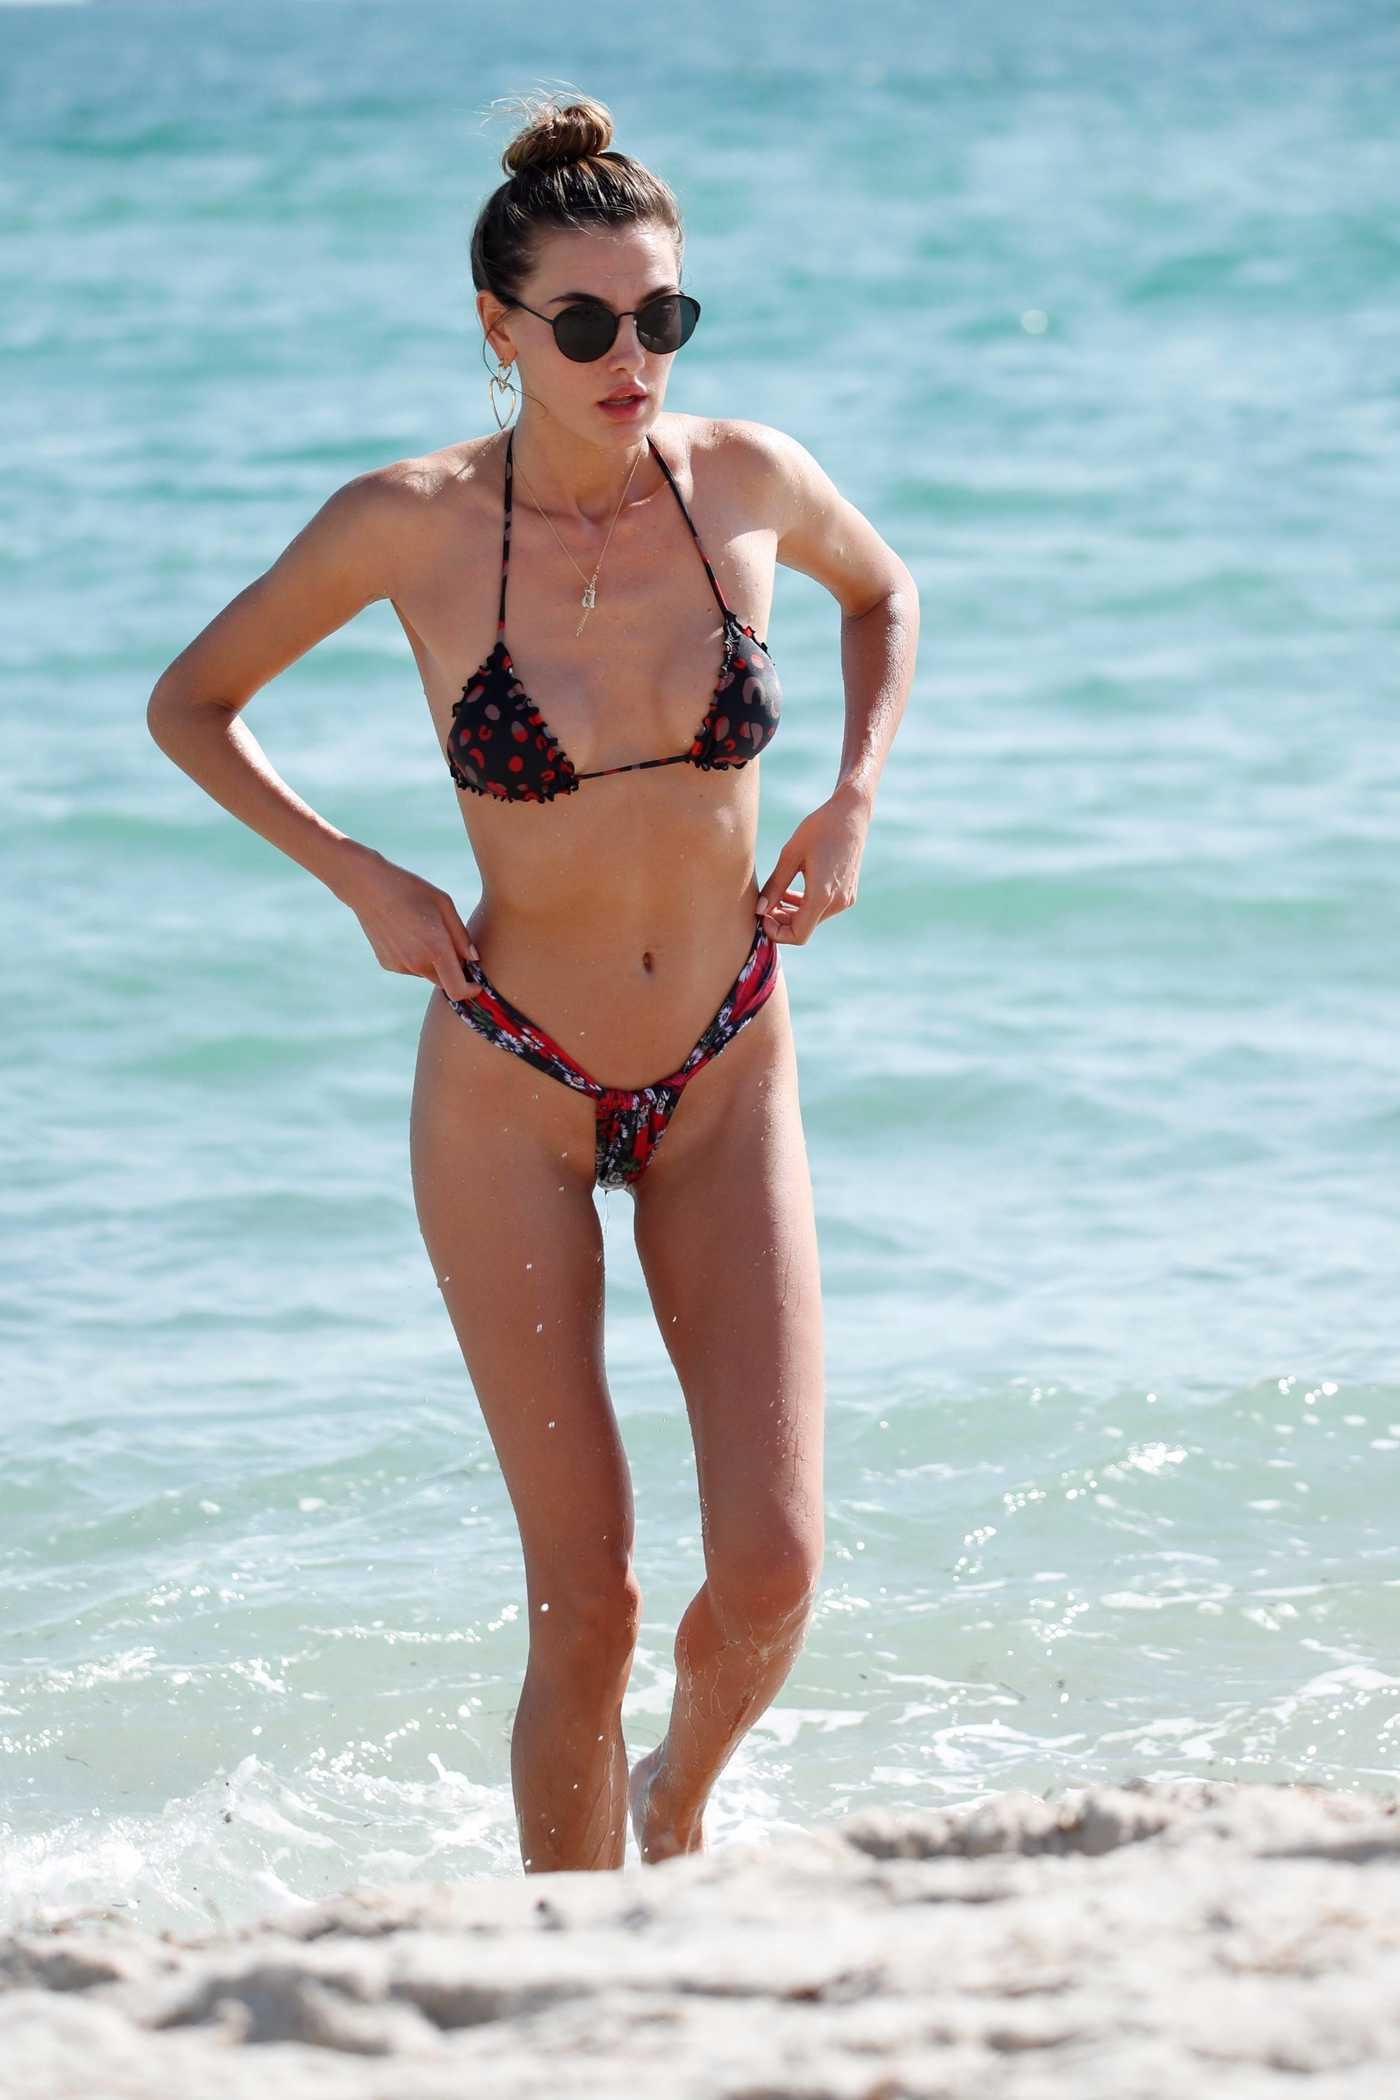 Alina Baikova in Bikini at the Beach in Miami 12/08/2017